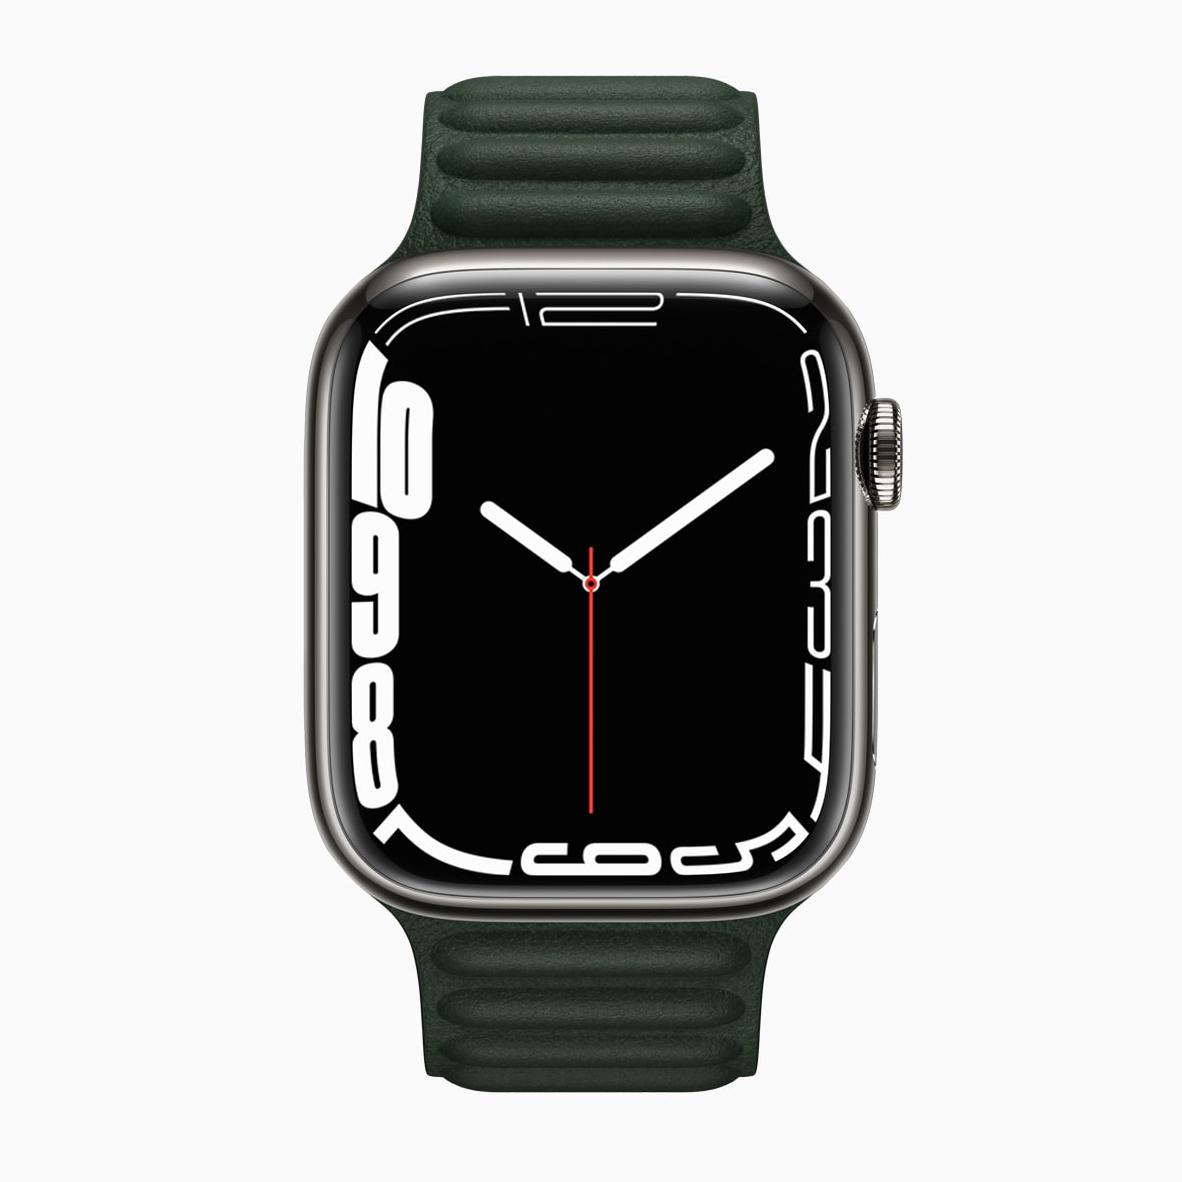 apple watch series 7 press render green leather strap